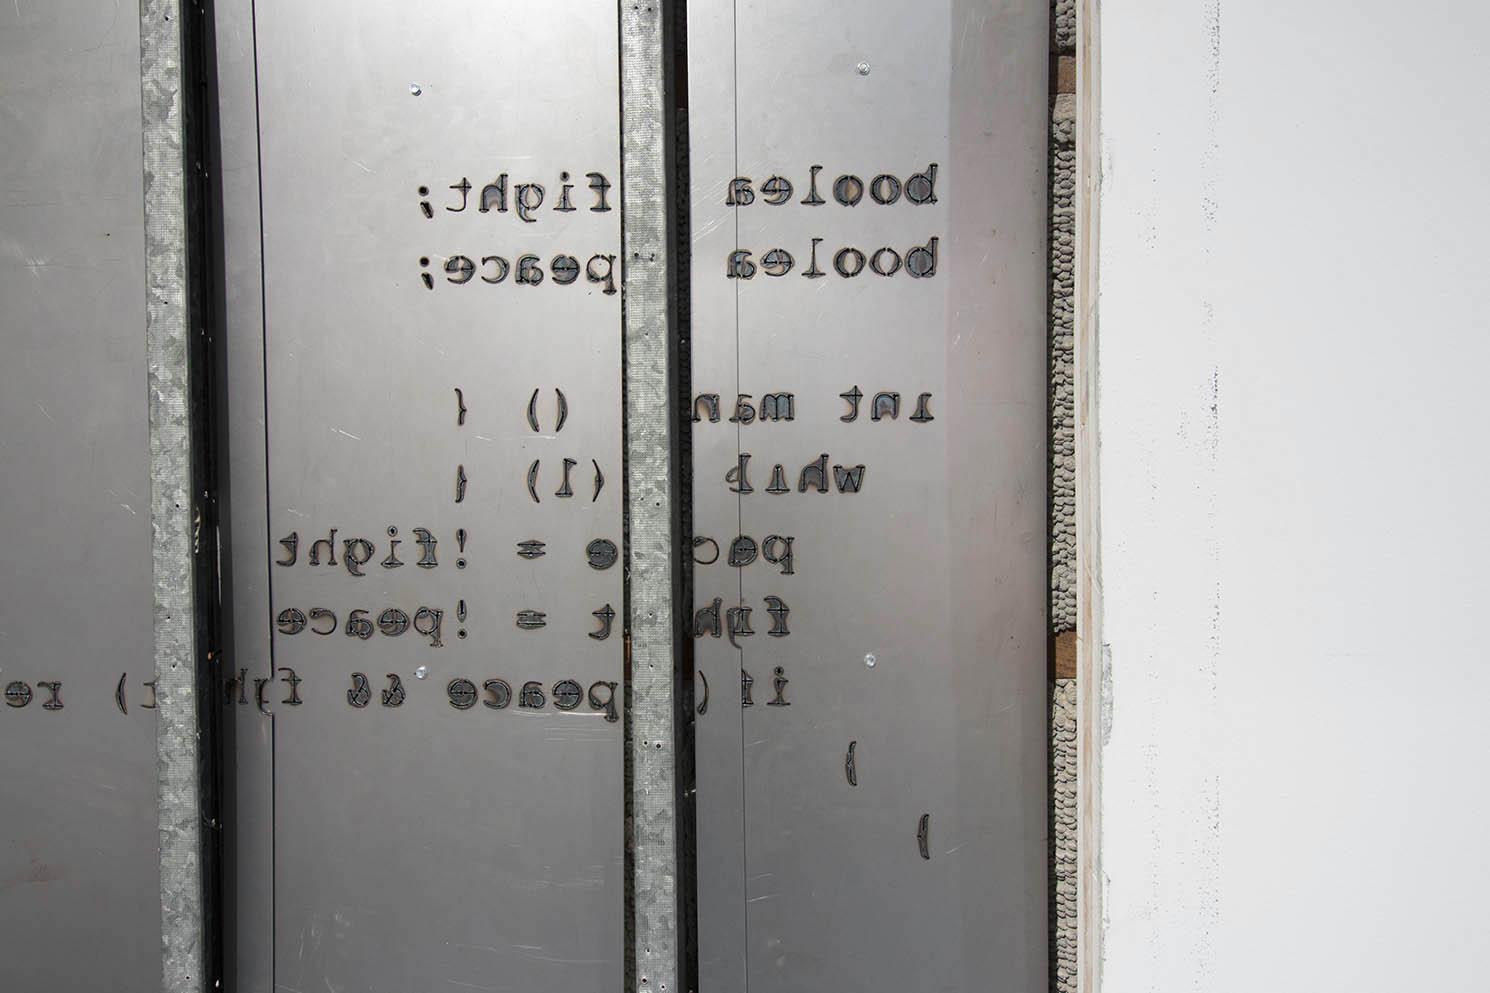 inside_wall_closeup_walter.jpg